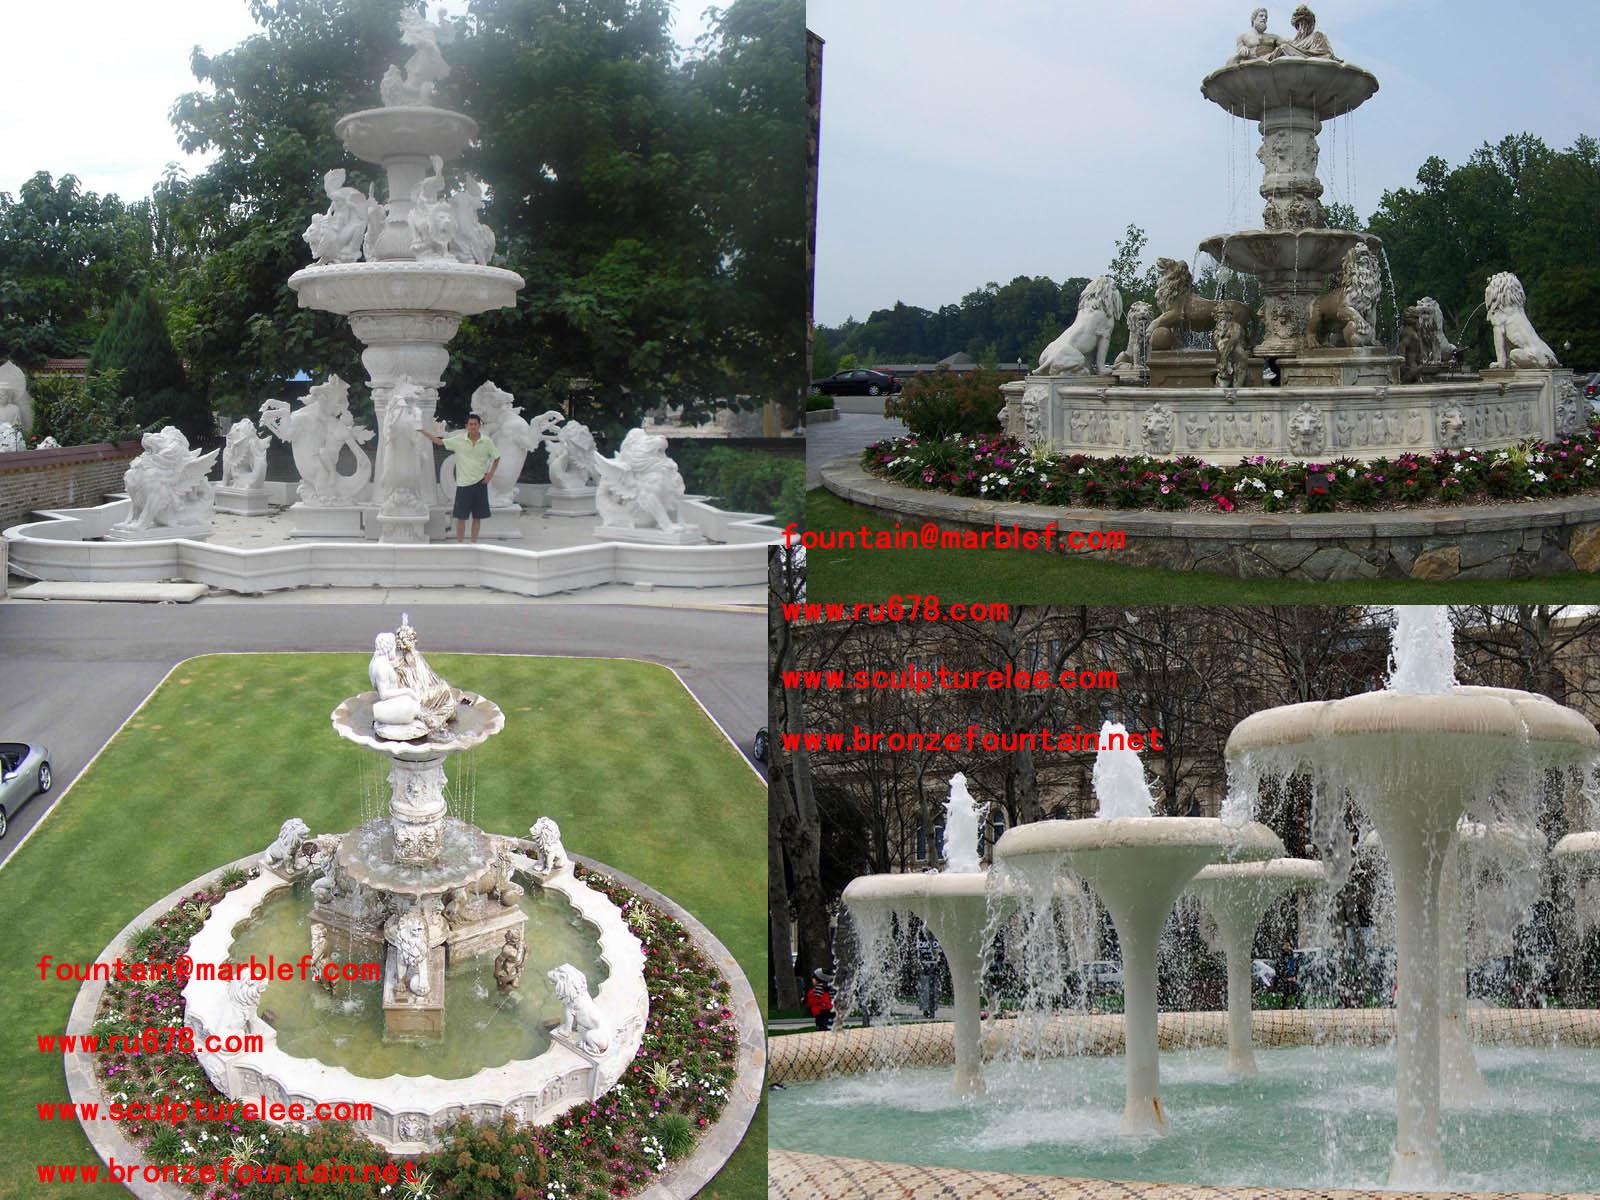 Bronze Tier Fountain,bronze Figures Fountains,bronze Sculpture Fountains